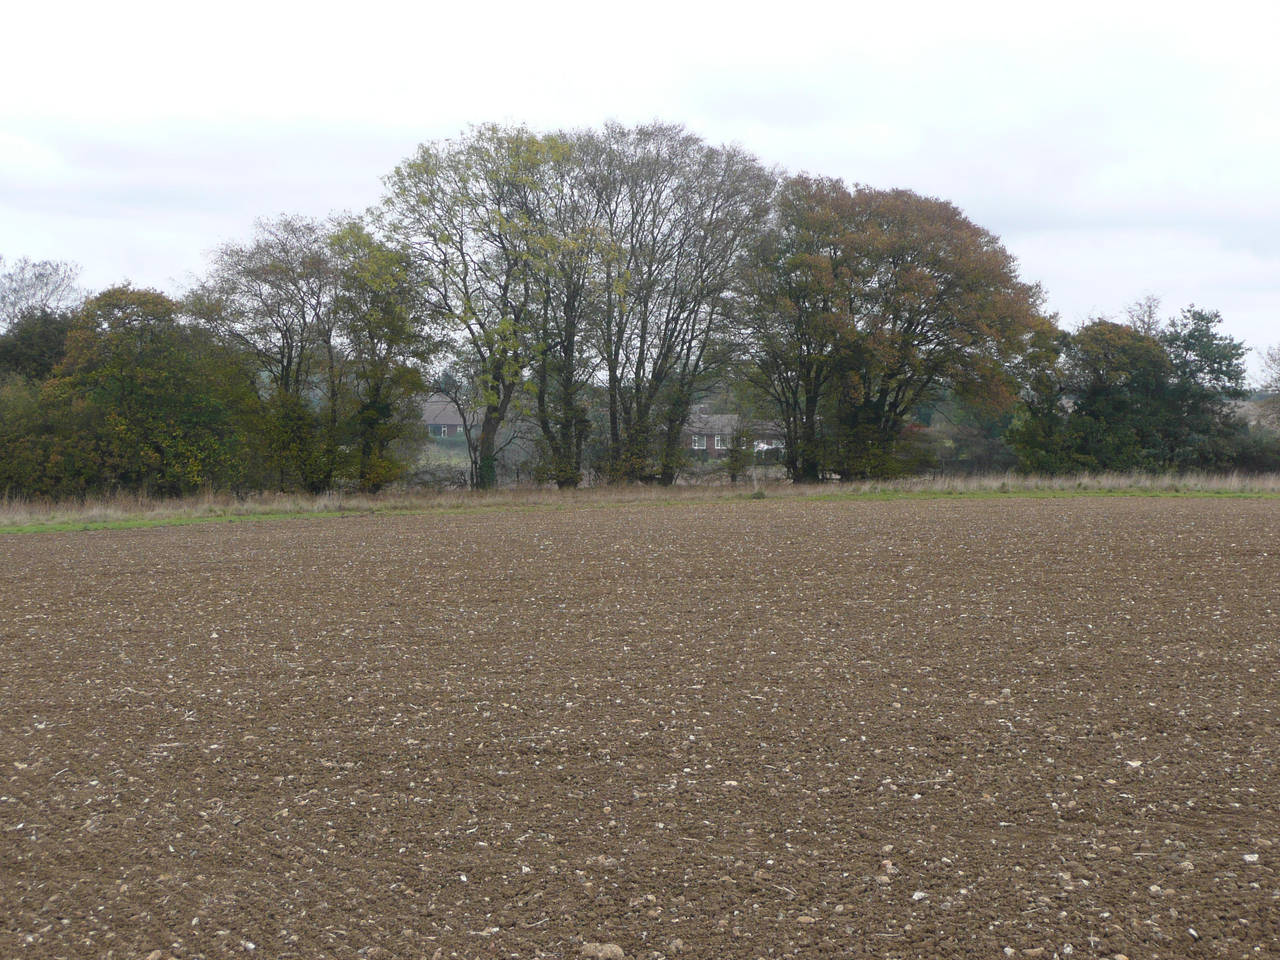 Bare Field 2 by AdenarKaren